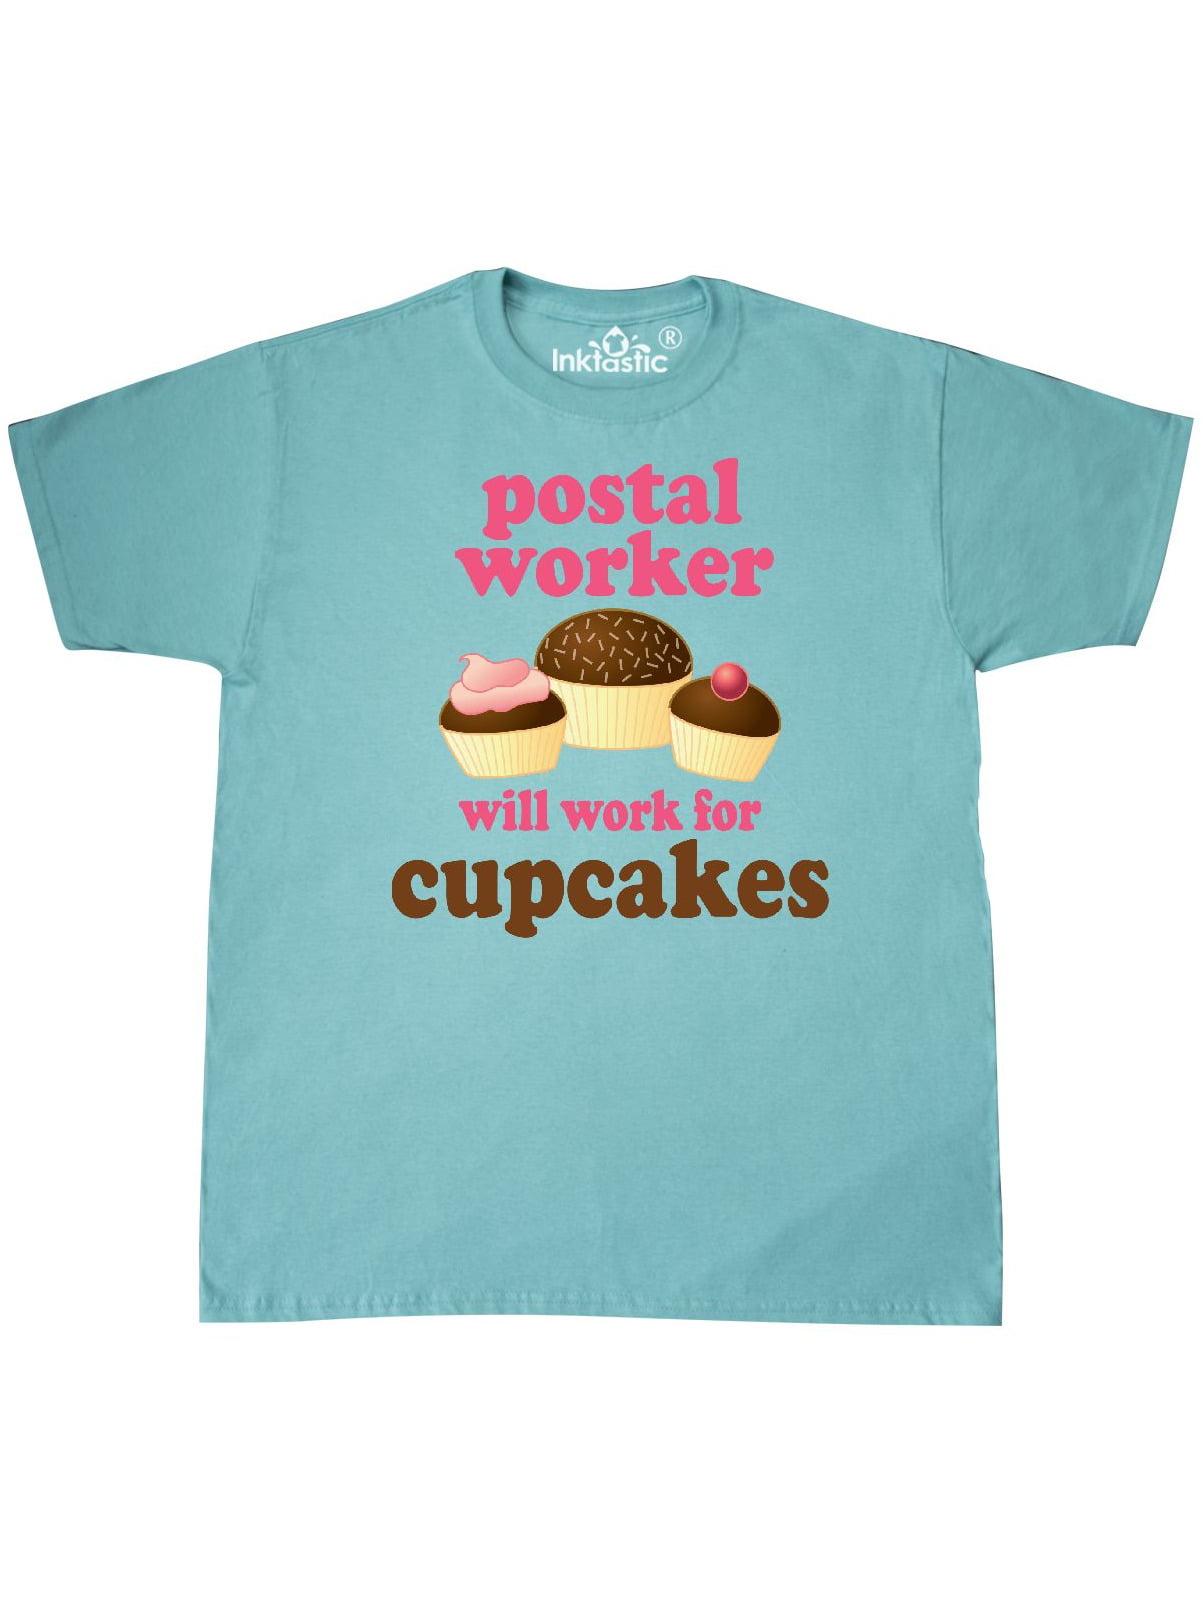 Inktastic Postal Worker Funny T Shirt Walmart Com Walmart Com